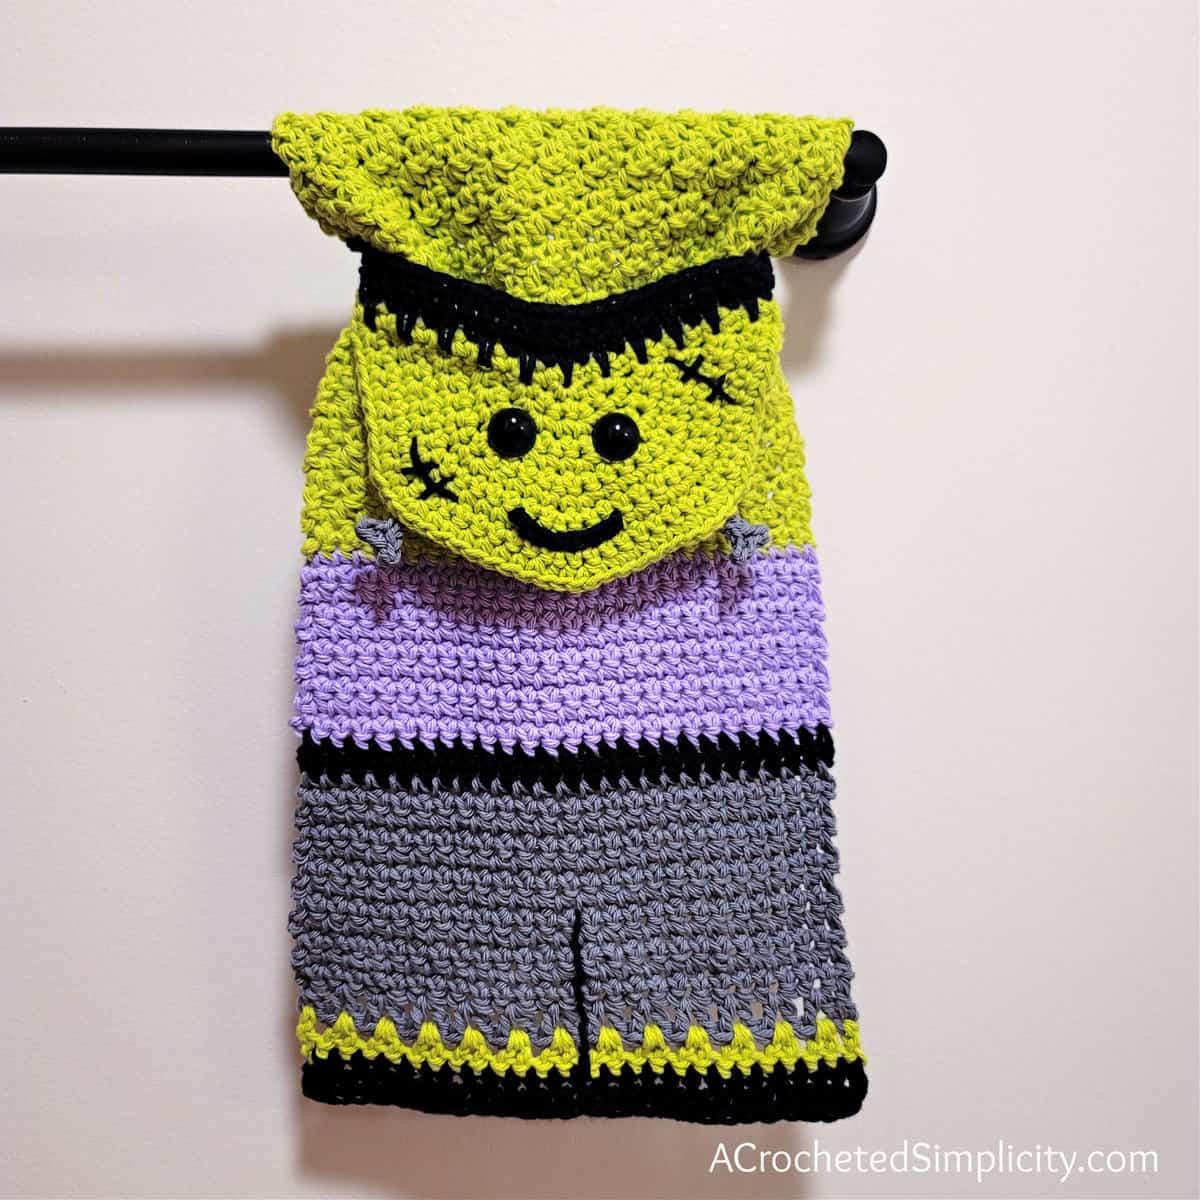 Free Crochet Towel Pattern - Frankenstein's Monster Kitchen Towel by A Crocheted Simplicity #freecrochetpattern #crochetmonster #crochetmonsterpattern #freecrochetfrankensteinpattern #crochet #crochettowel #crochettowelpattern #handmade #halloweentowel #frankensteintowel #frankensteincrochet #crochetfrankenstein